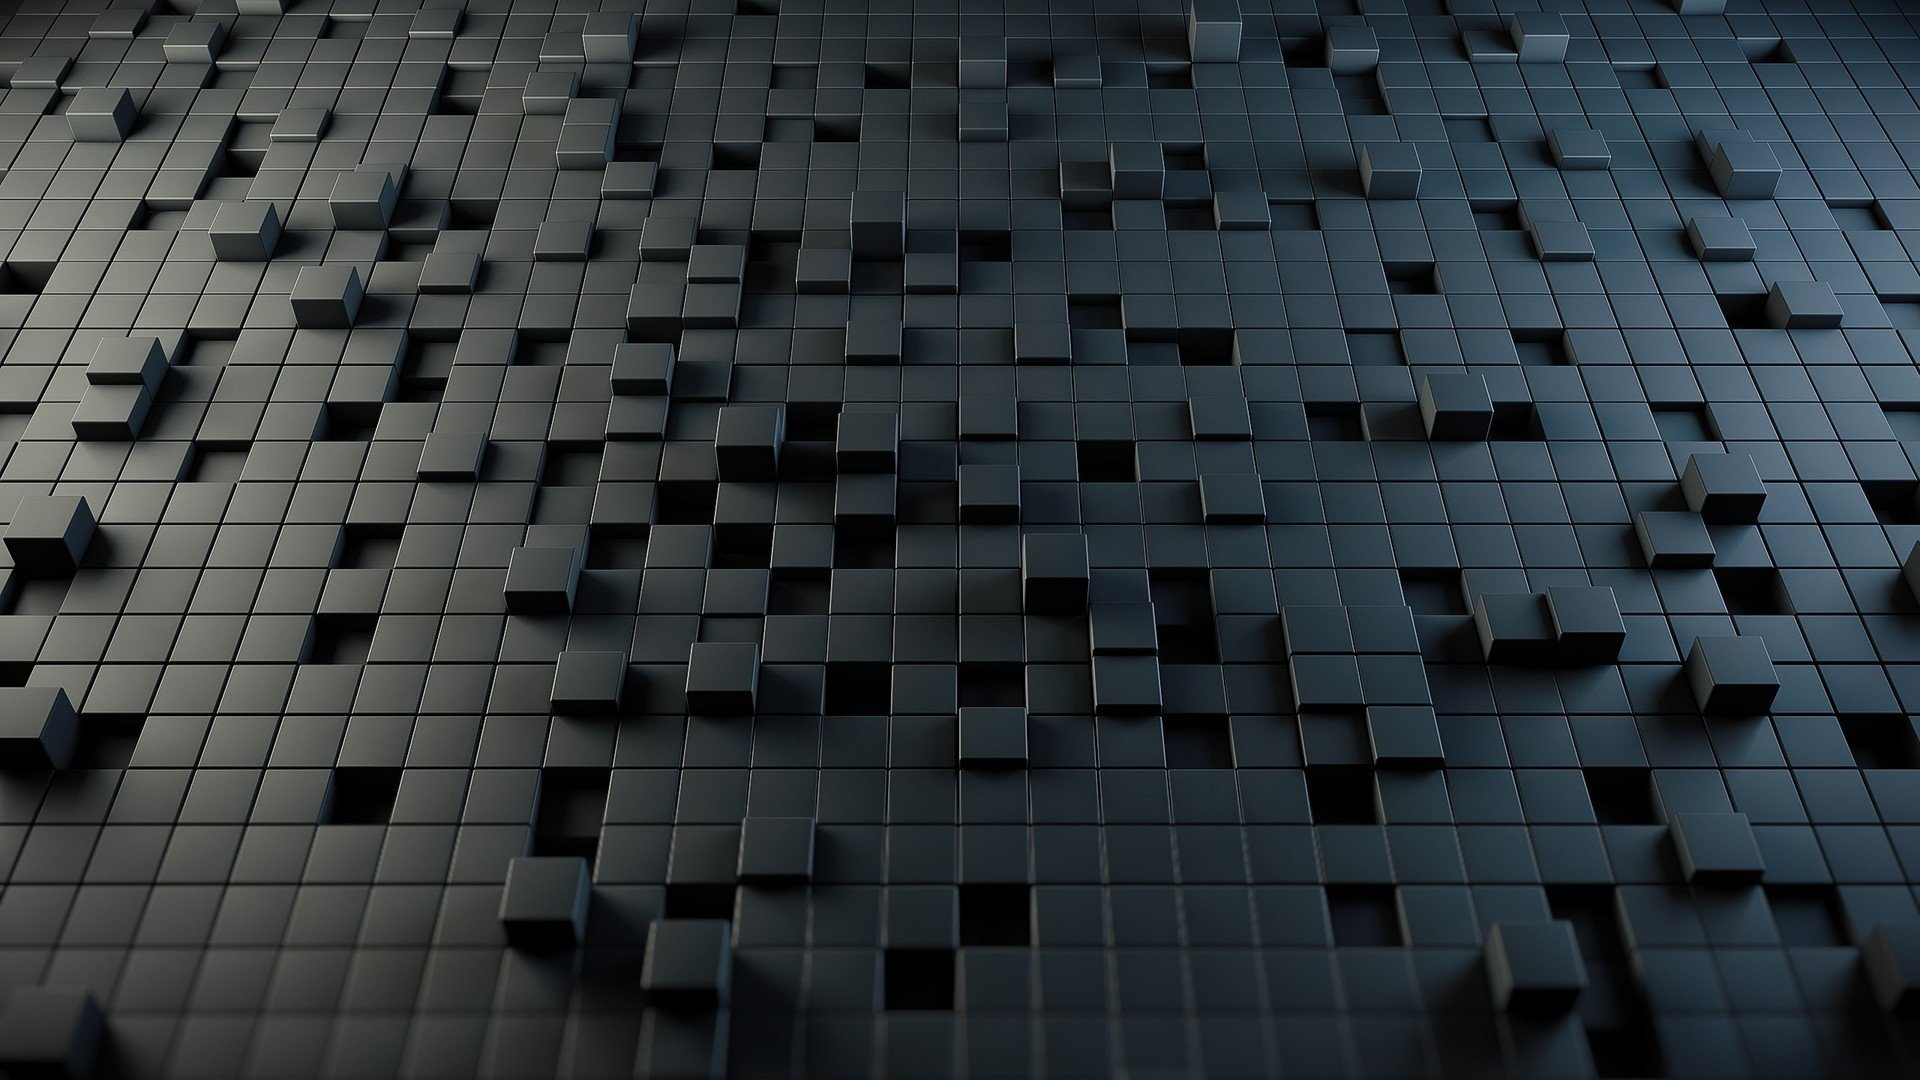 wallpaper 1920x1080 cube square -#main